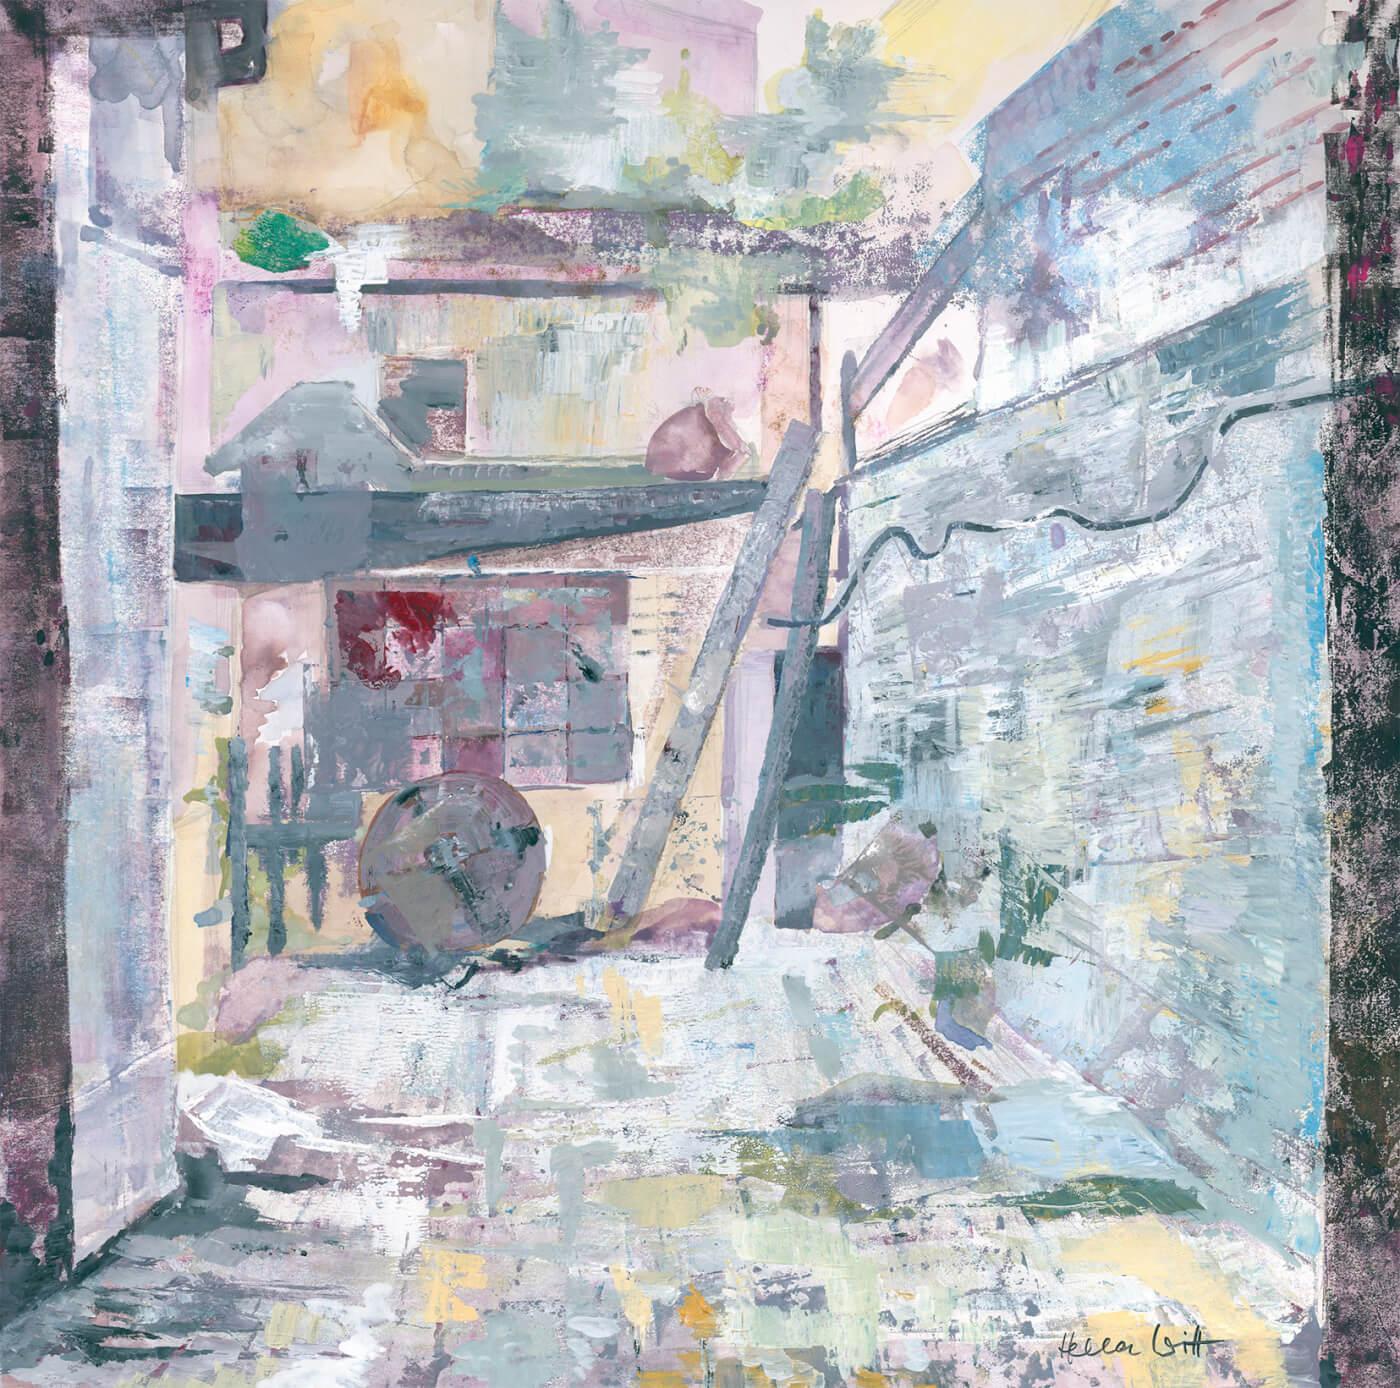 Ottensen, Hinterhof, Stadtteil, Kunst